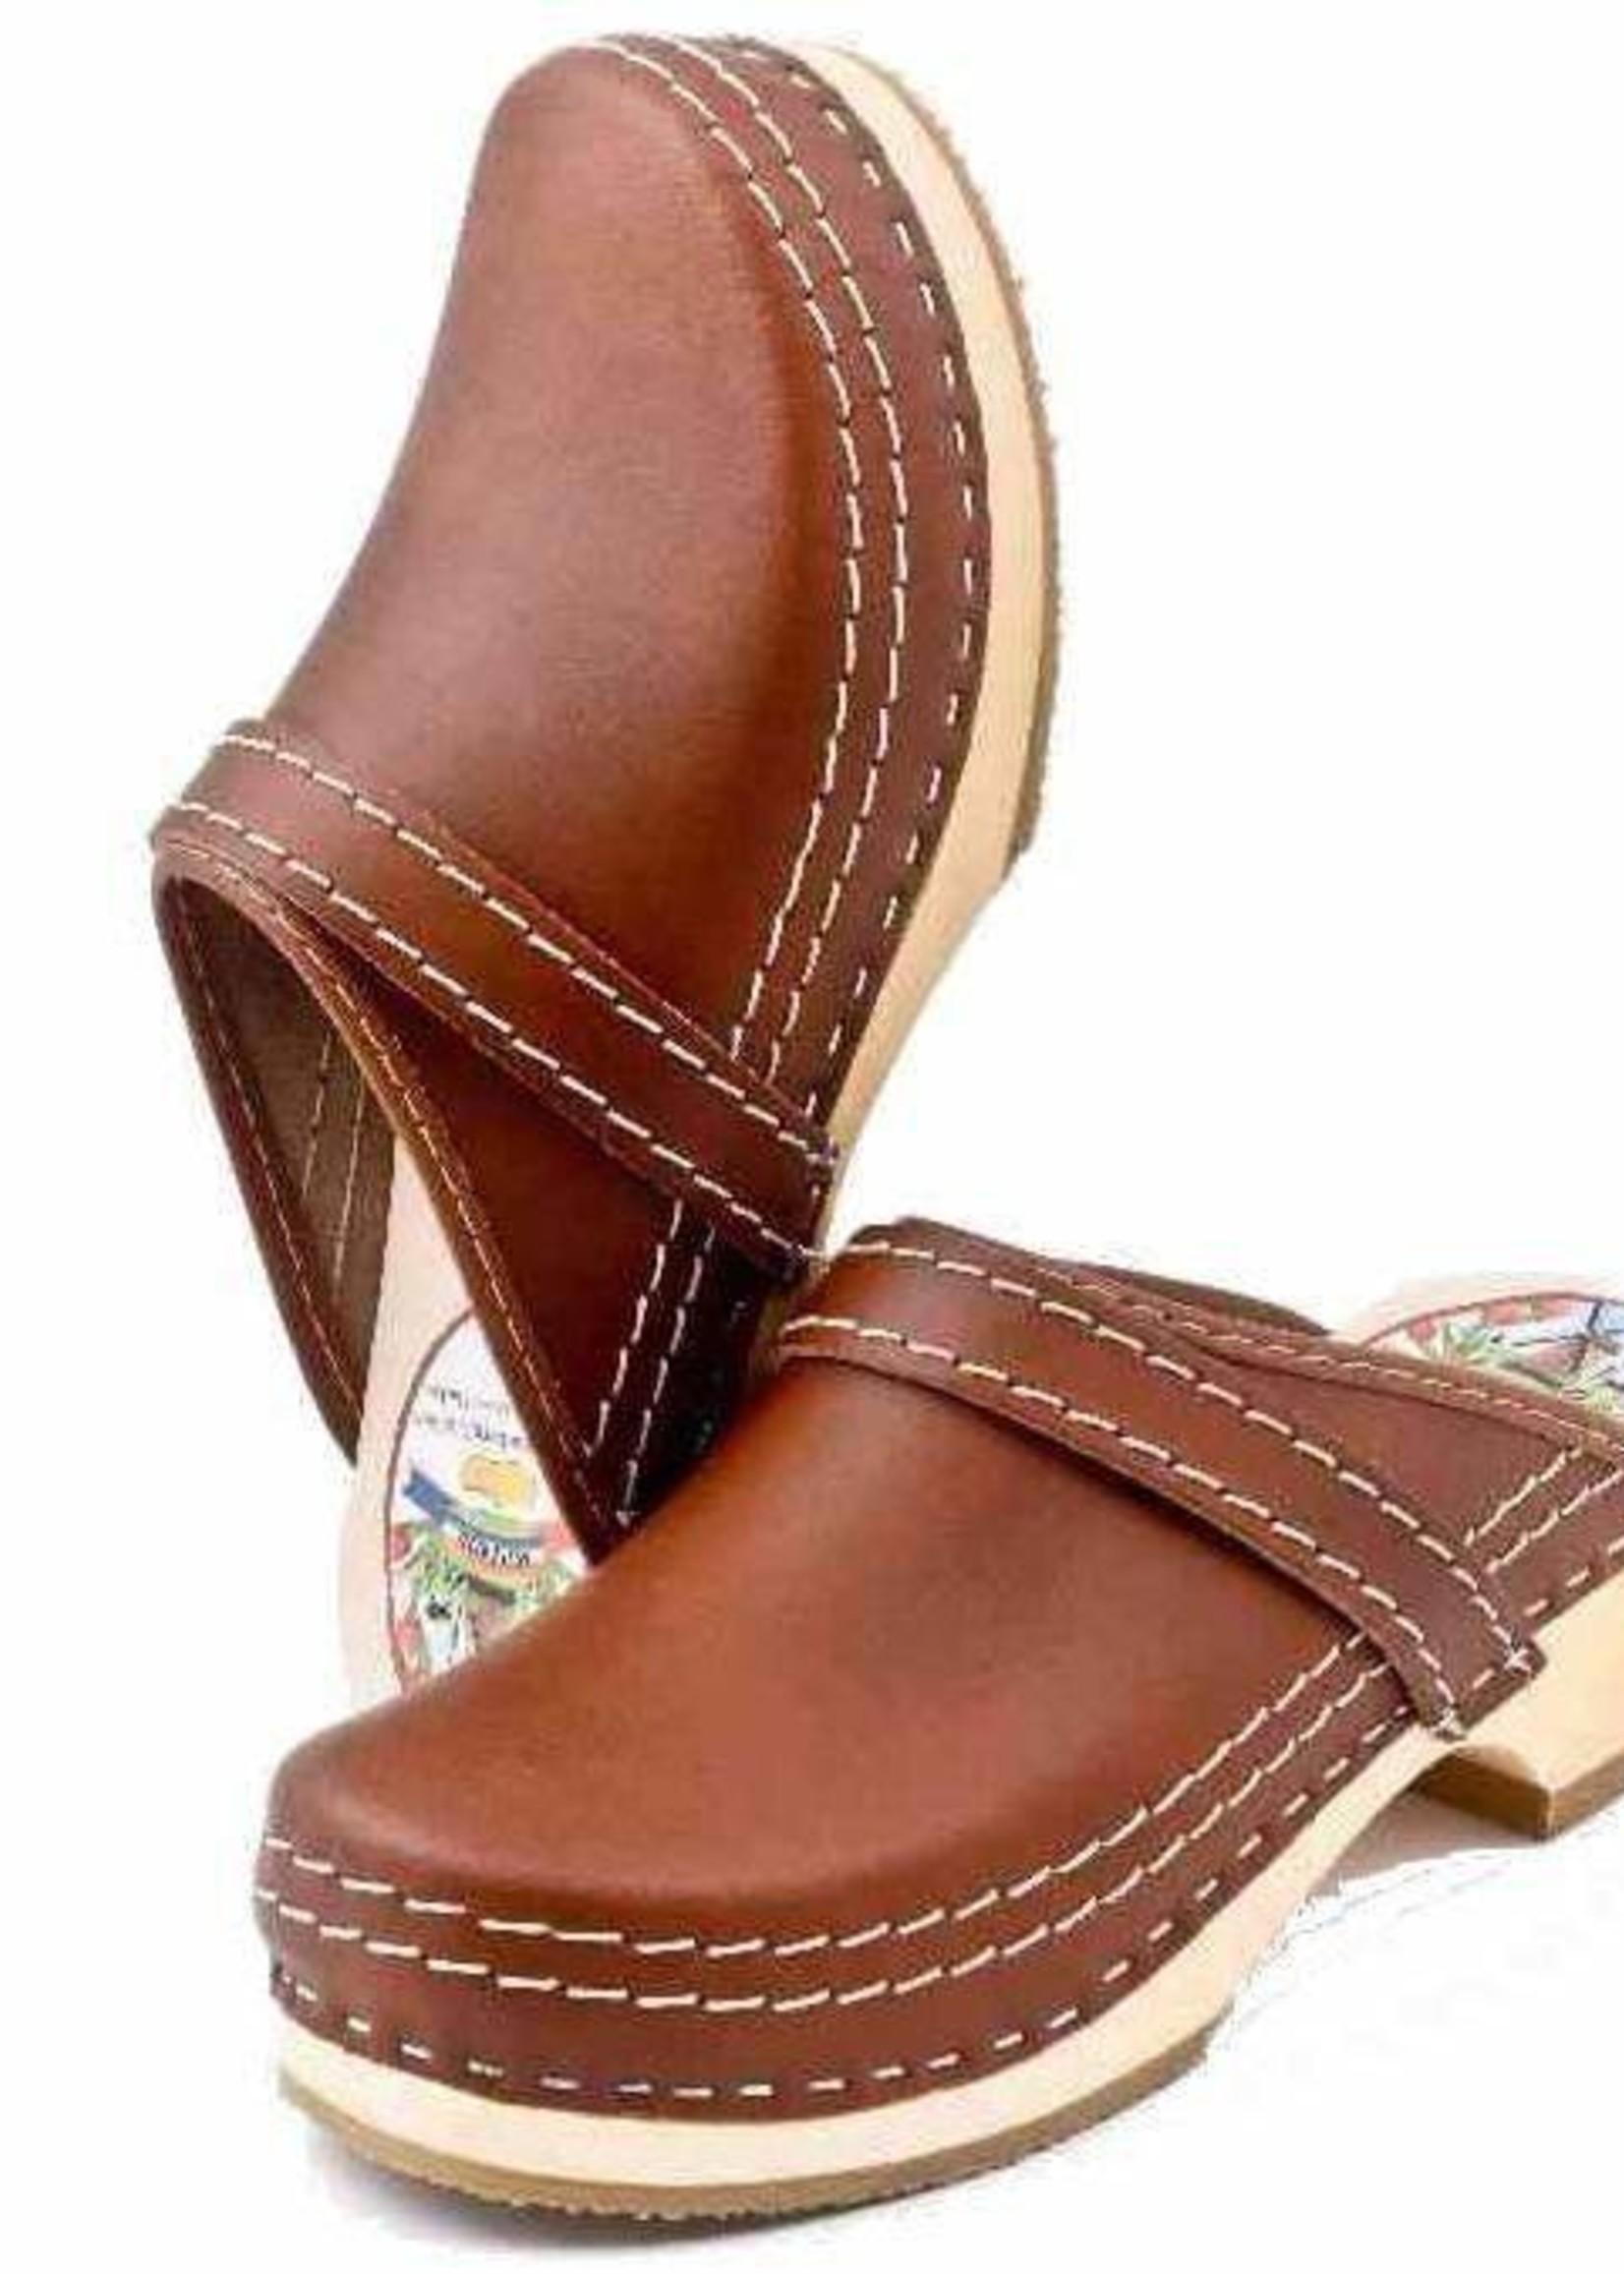 Simson Leather Clogs, Simson, Brown, Orthepedic Footwear